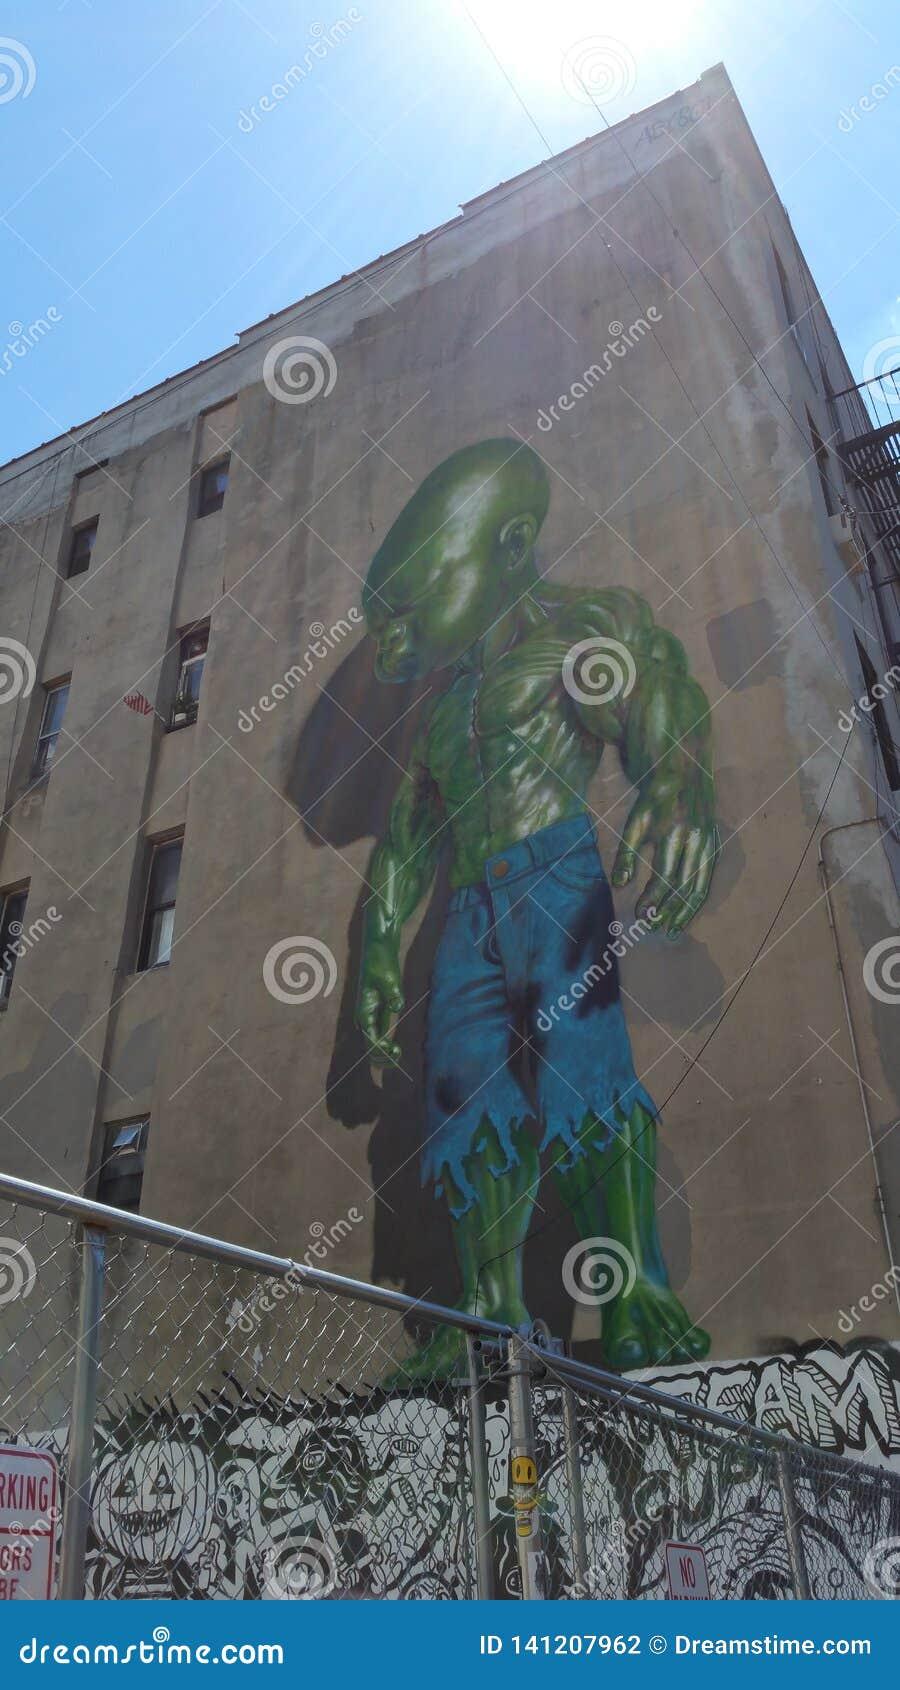 Nueva York graffiti